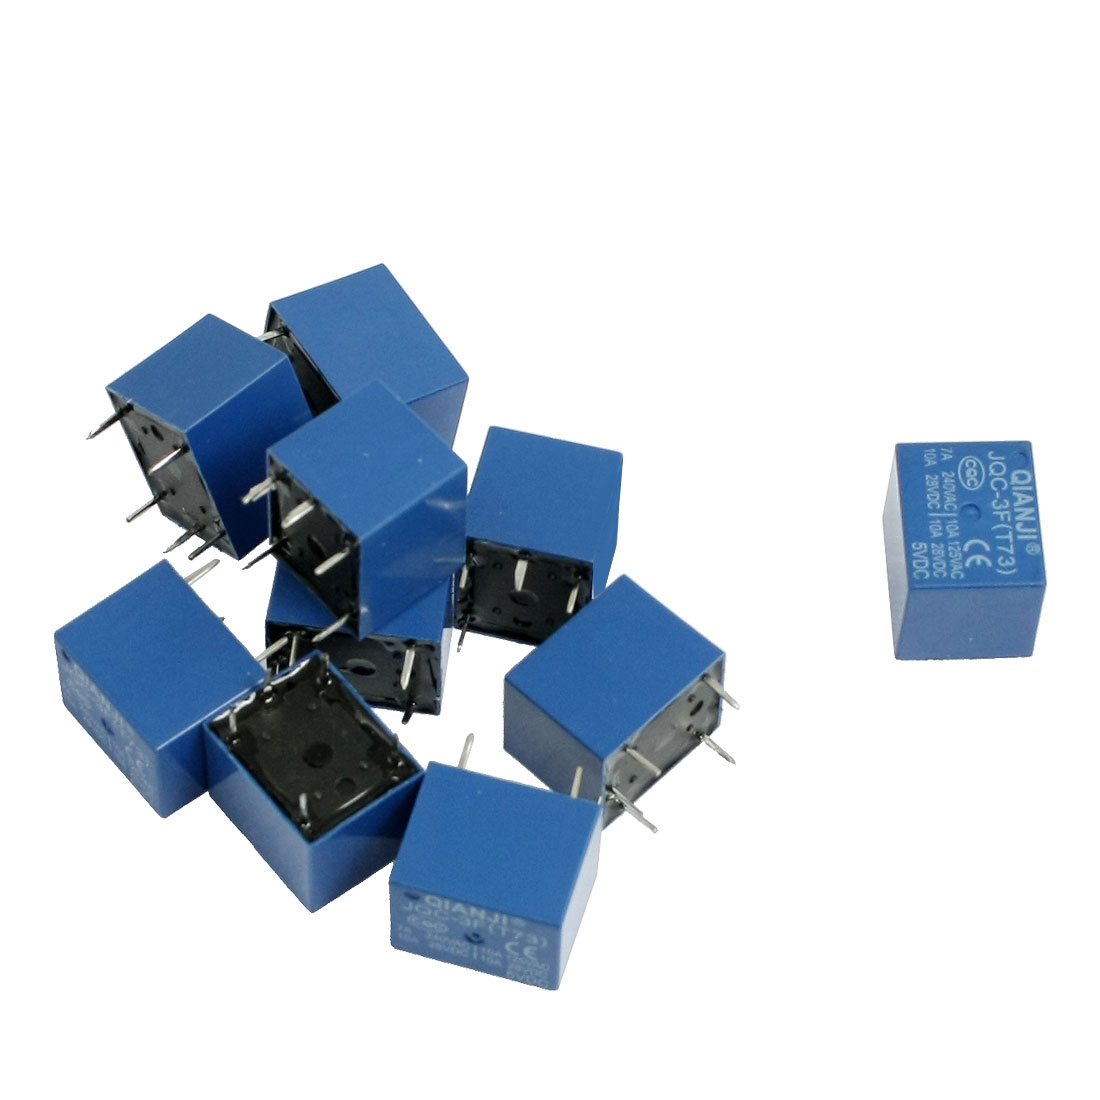 10 Pcs DC 5V Coil 7A 240VAC 10A 125VAC/28VDC 5 Pins SPST Power Relay JQC-3F